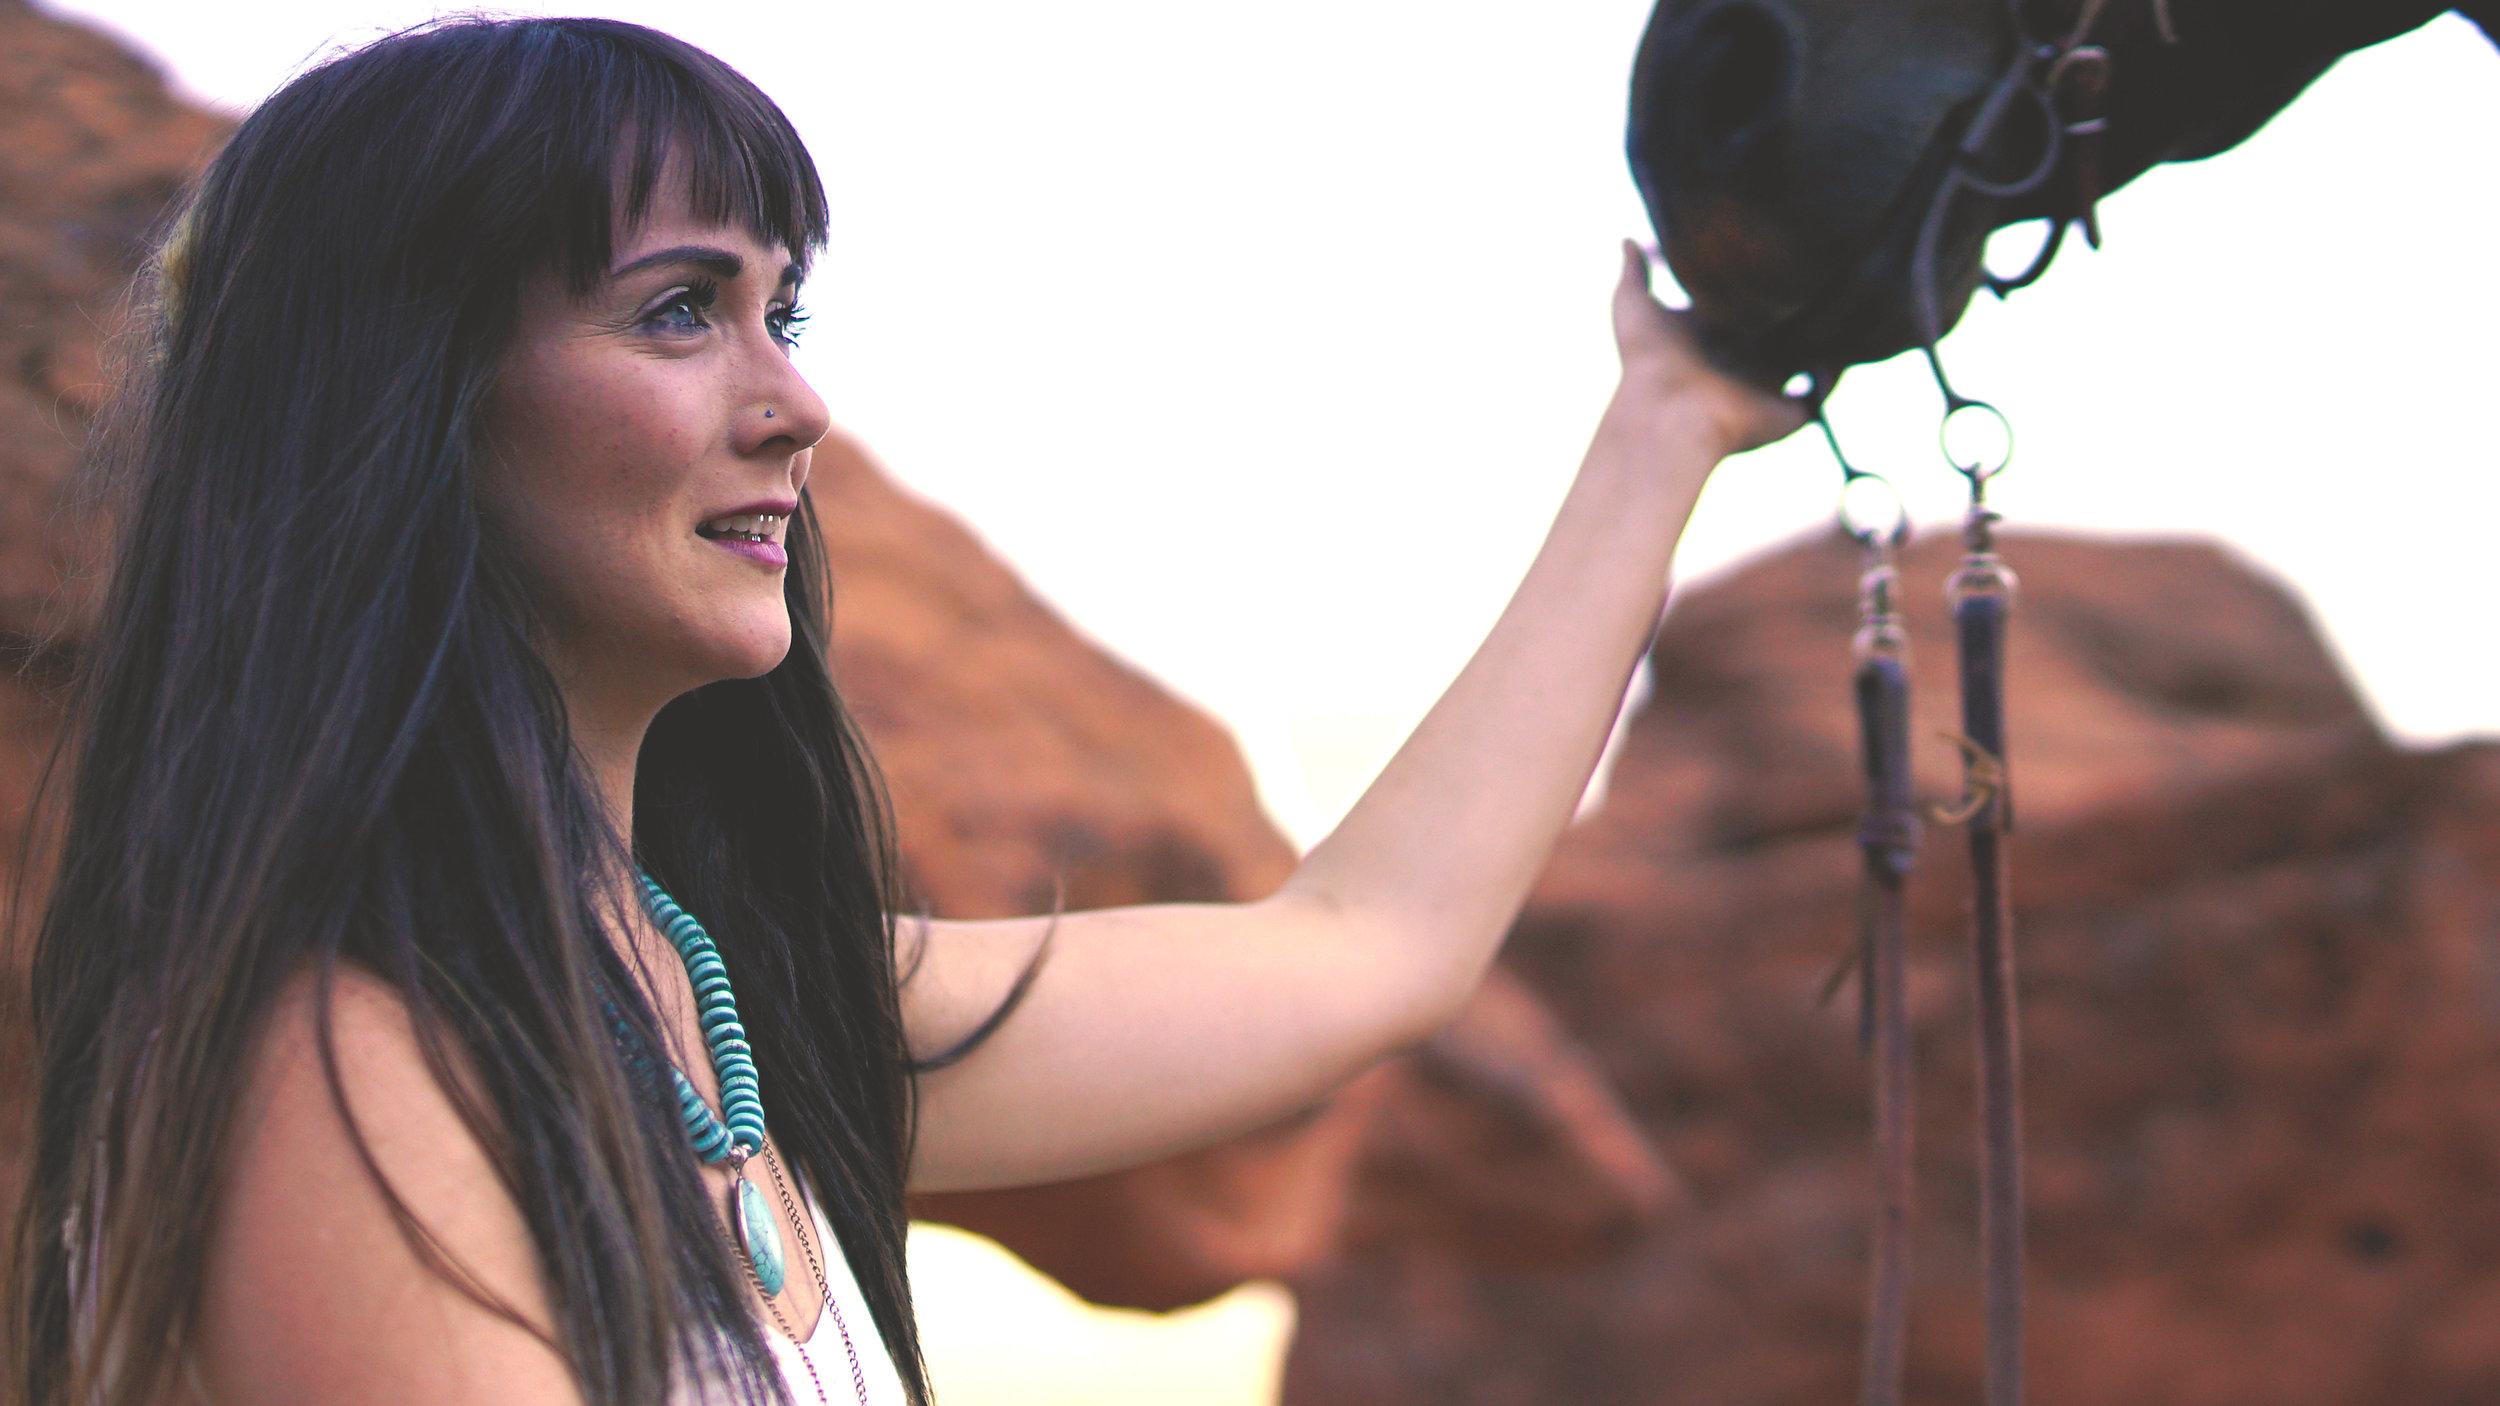 The future looks bright for Equestrian Aid Foundation recipient Alena Weida. Photo courtesy of Alena Weida.